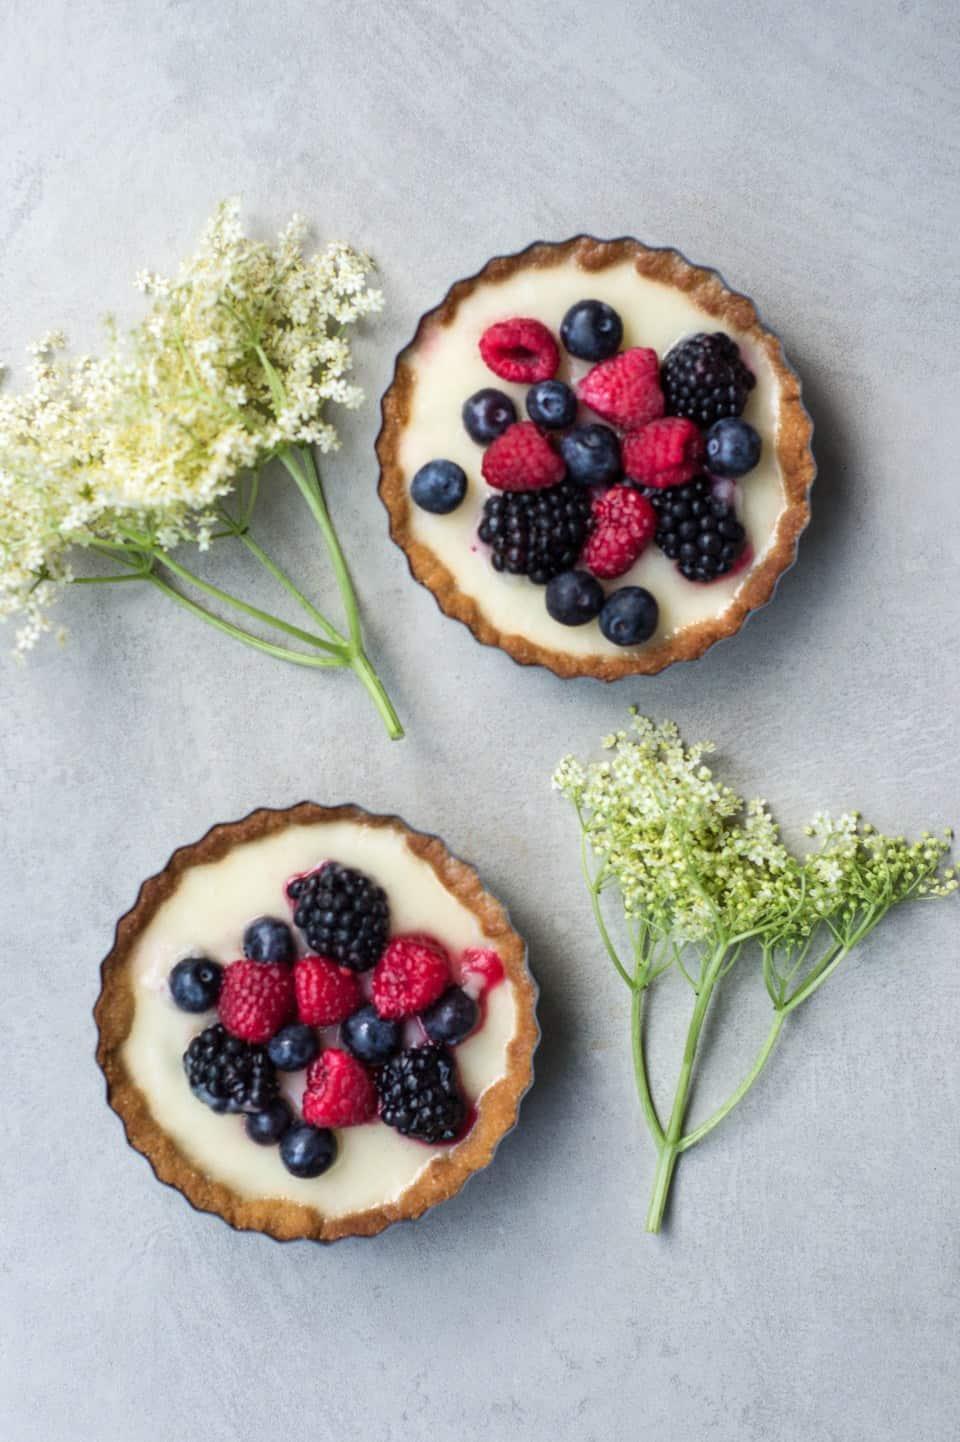 Lemon and Berry Tarts